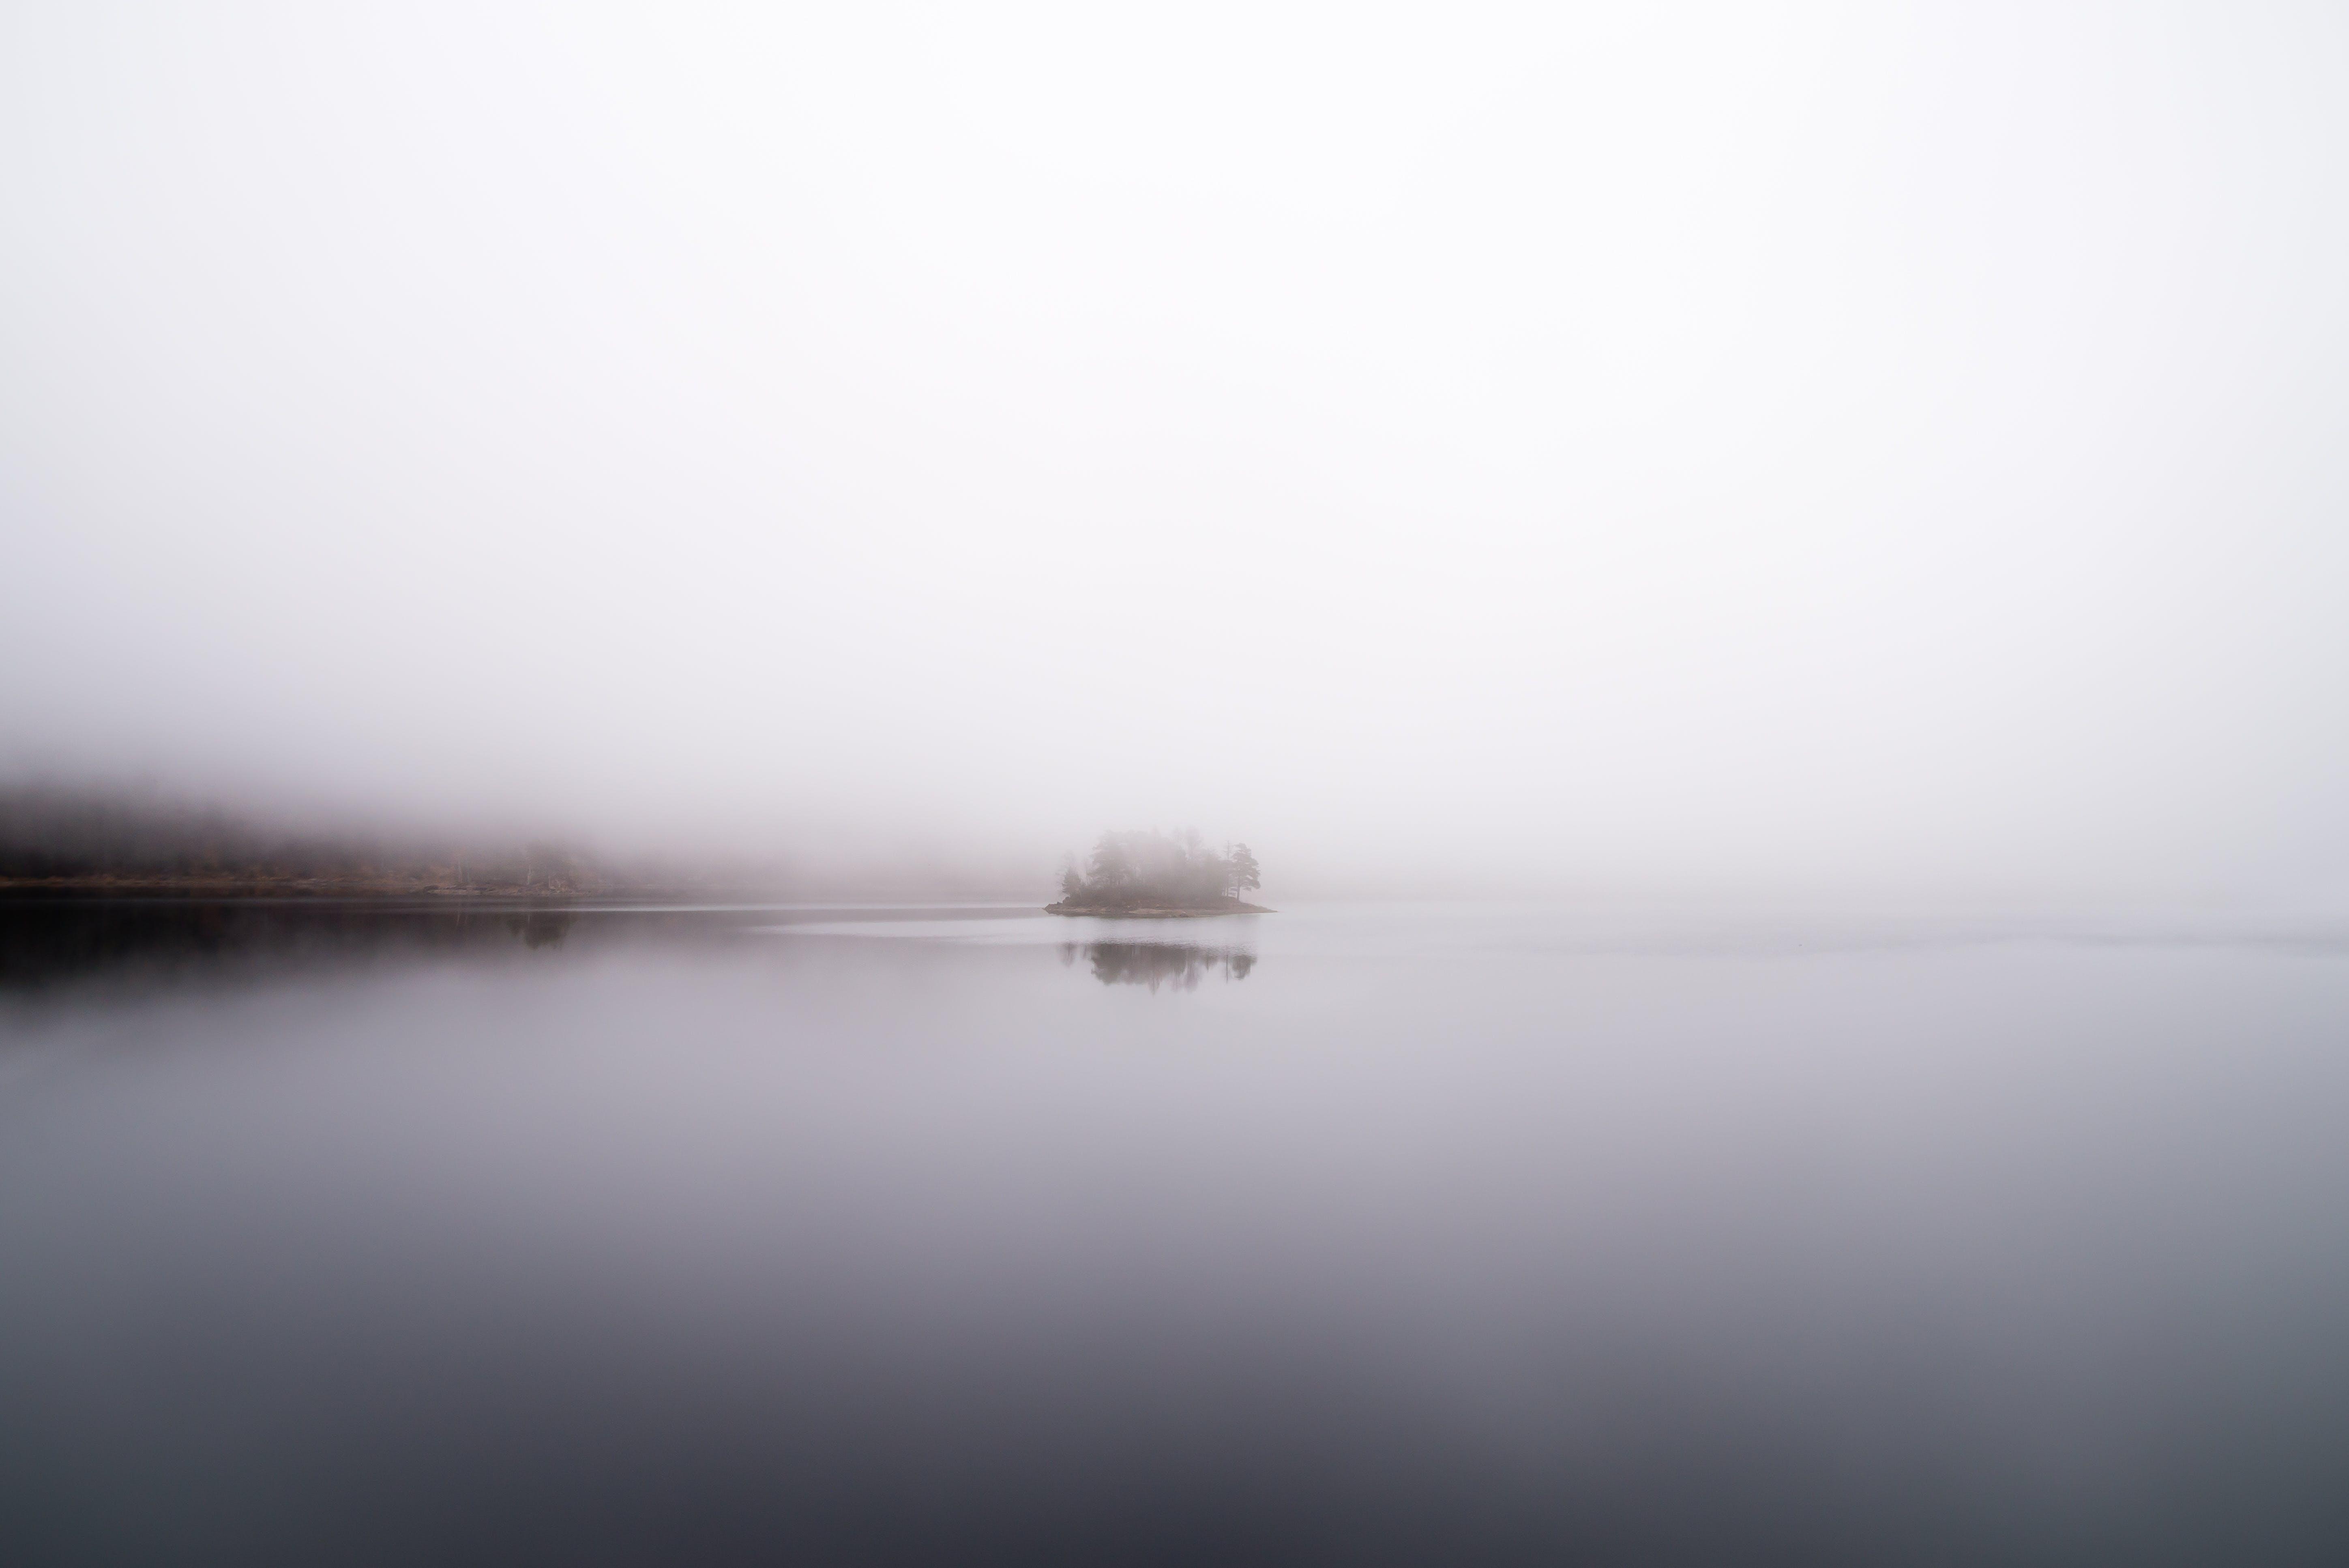 Desktop background of light, sea, dawn, landscape